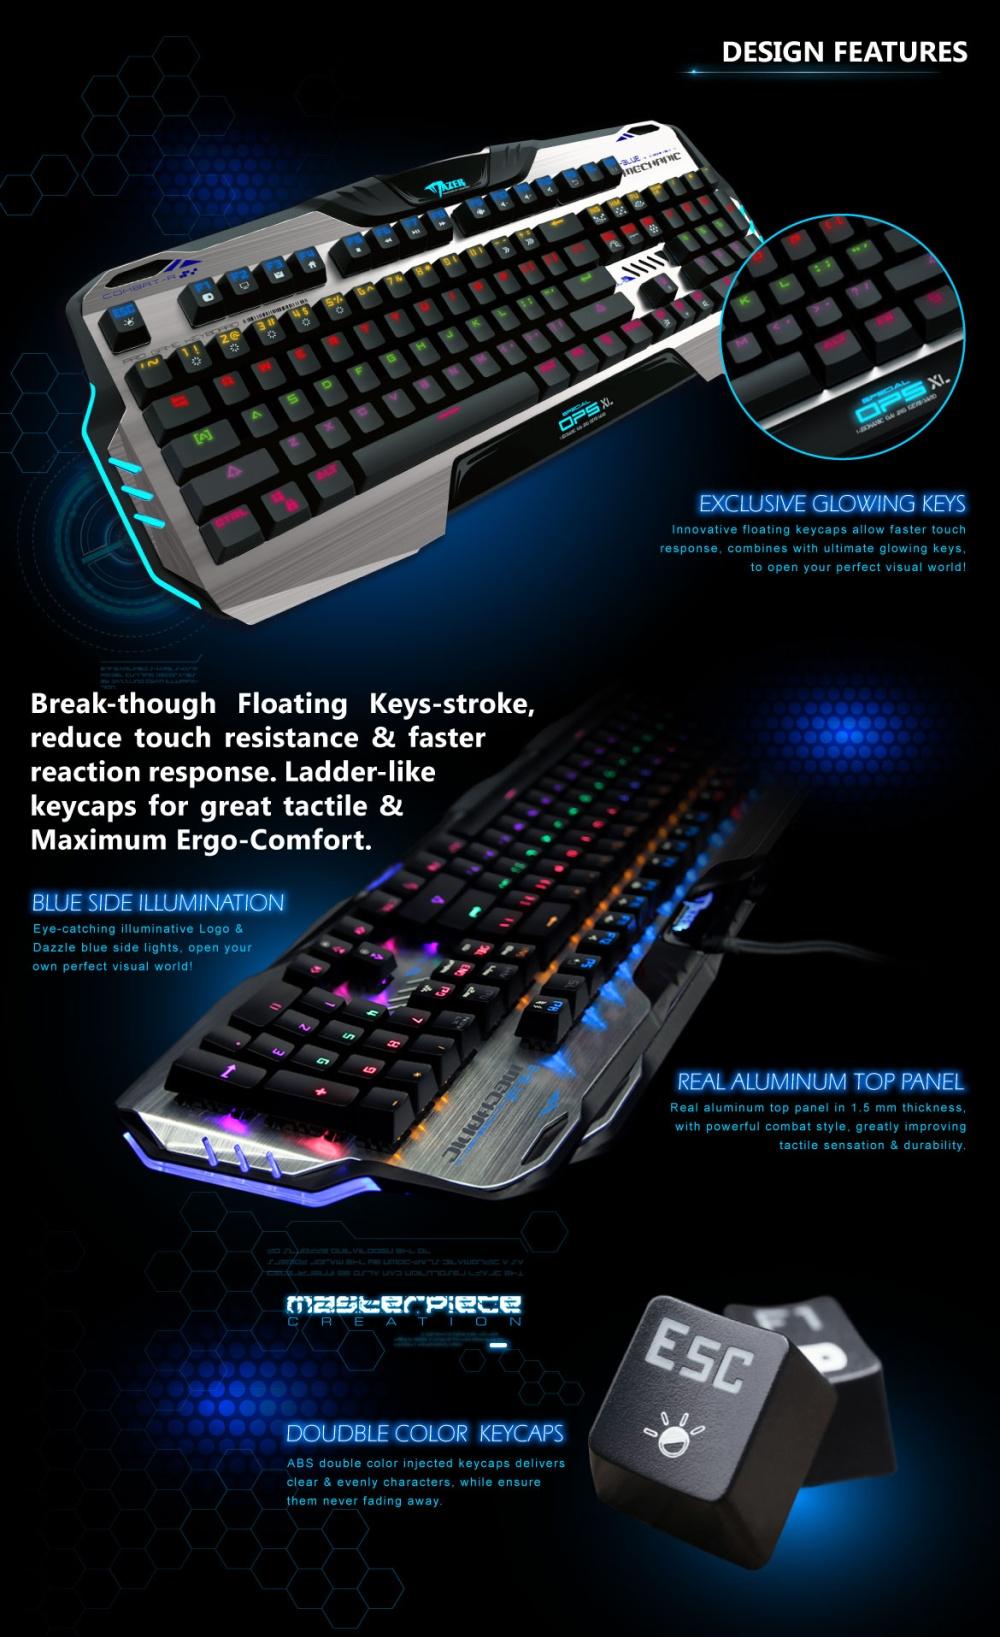 Weitech Zanfu Summoner L580 Mechanical Backlit Gaming Keyboard Cek Predator Mt K9340 Semi E Blue Mazer Ops Xl Di Desain Dengan Khusus Tidak